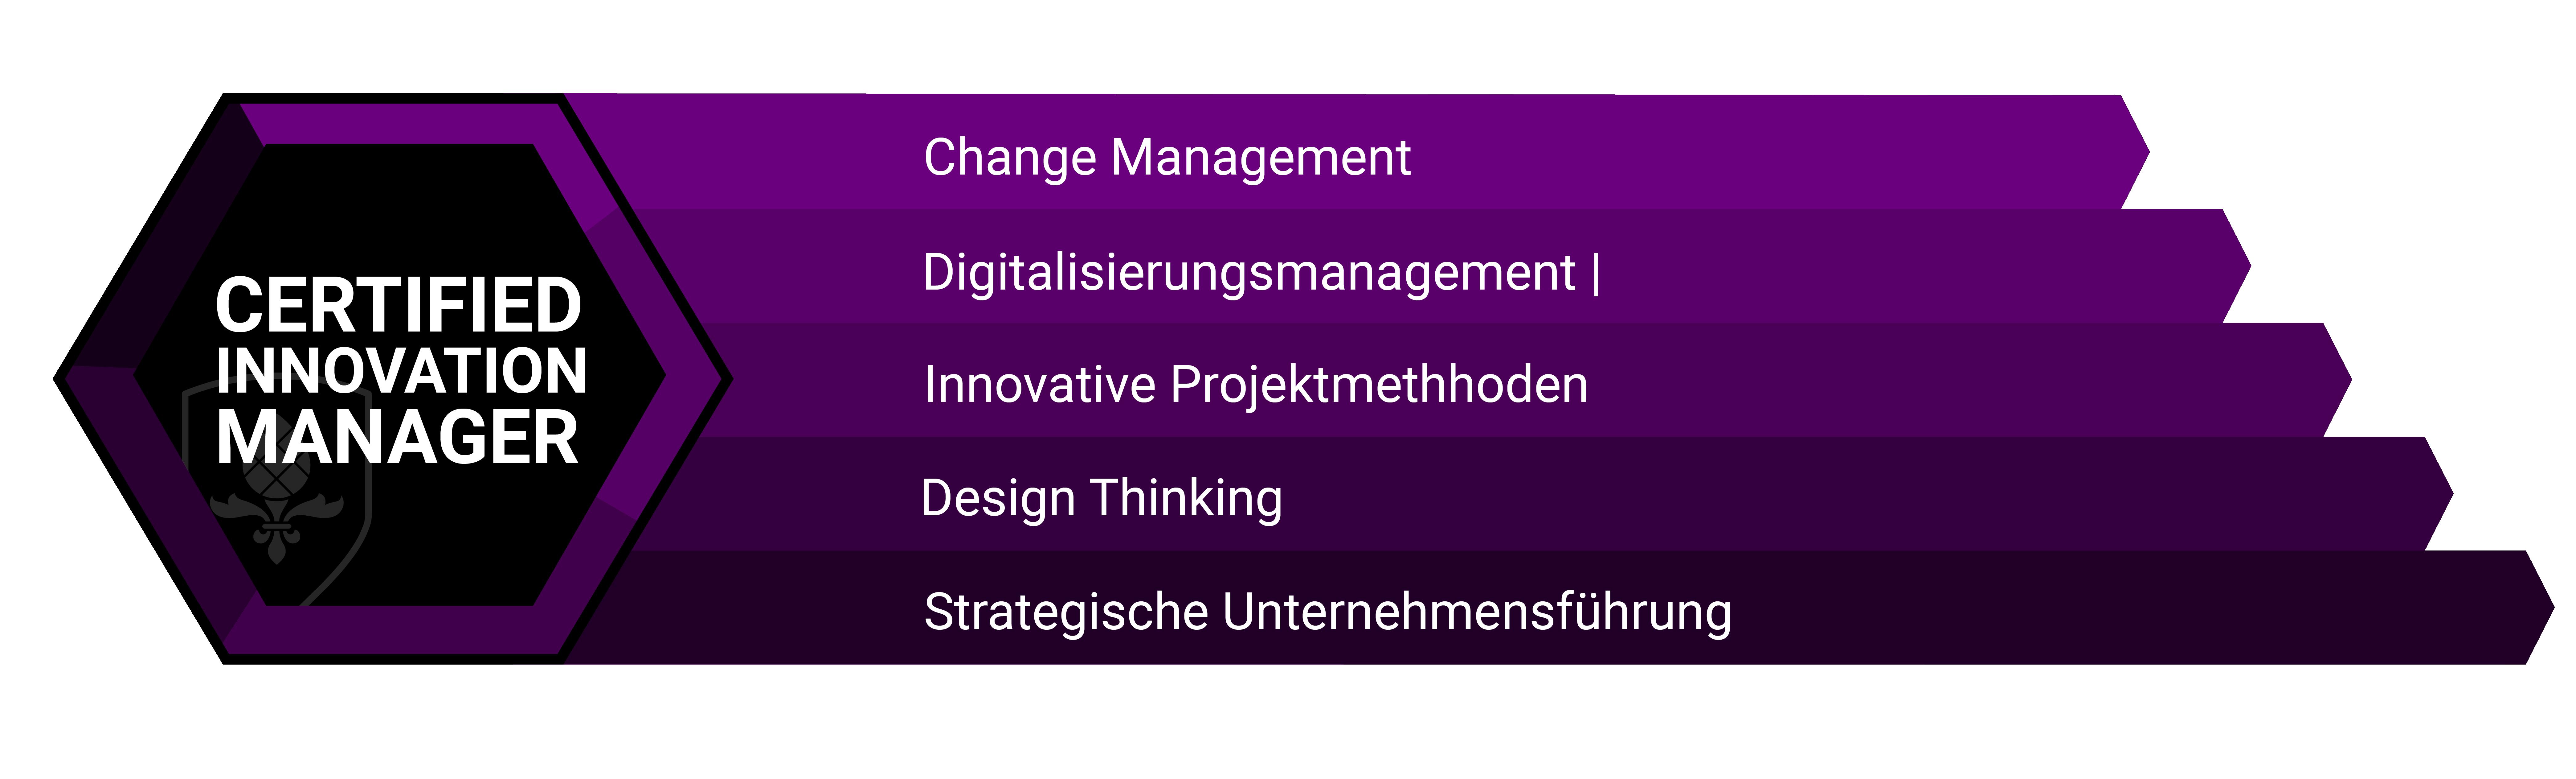 Innovation Management Kurs